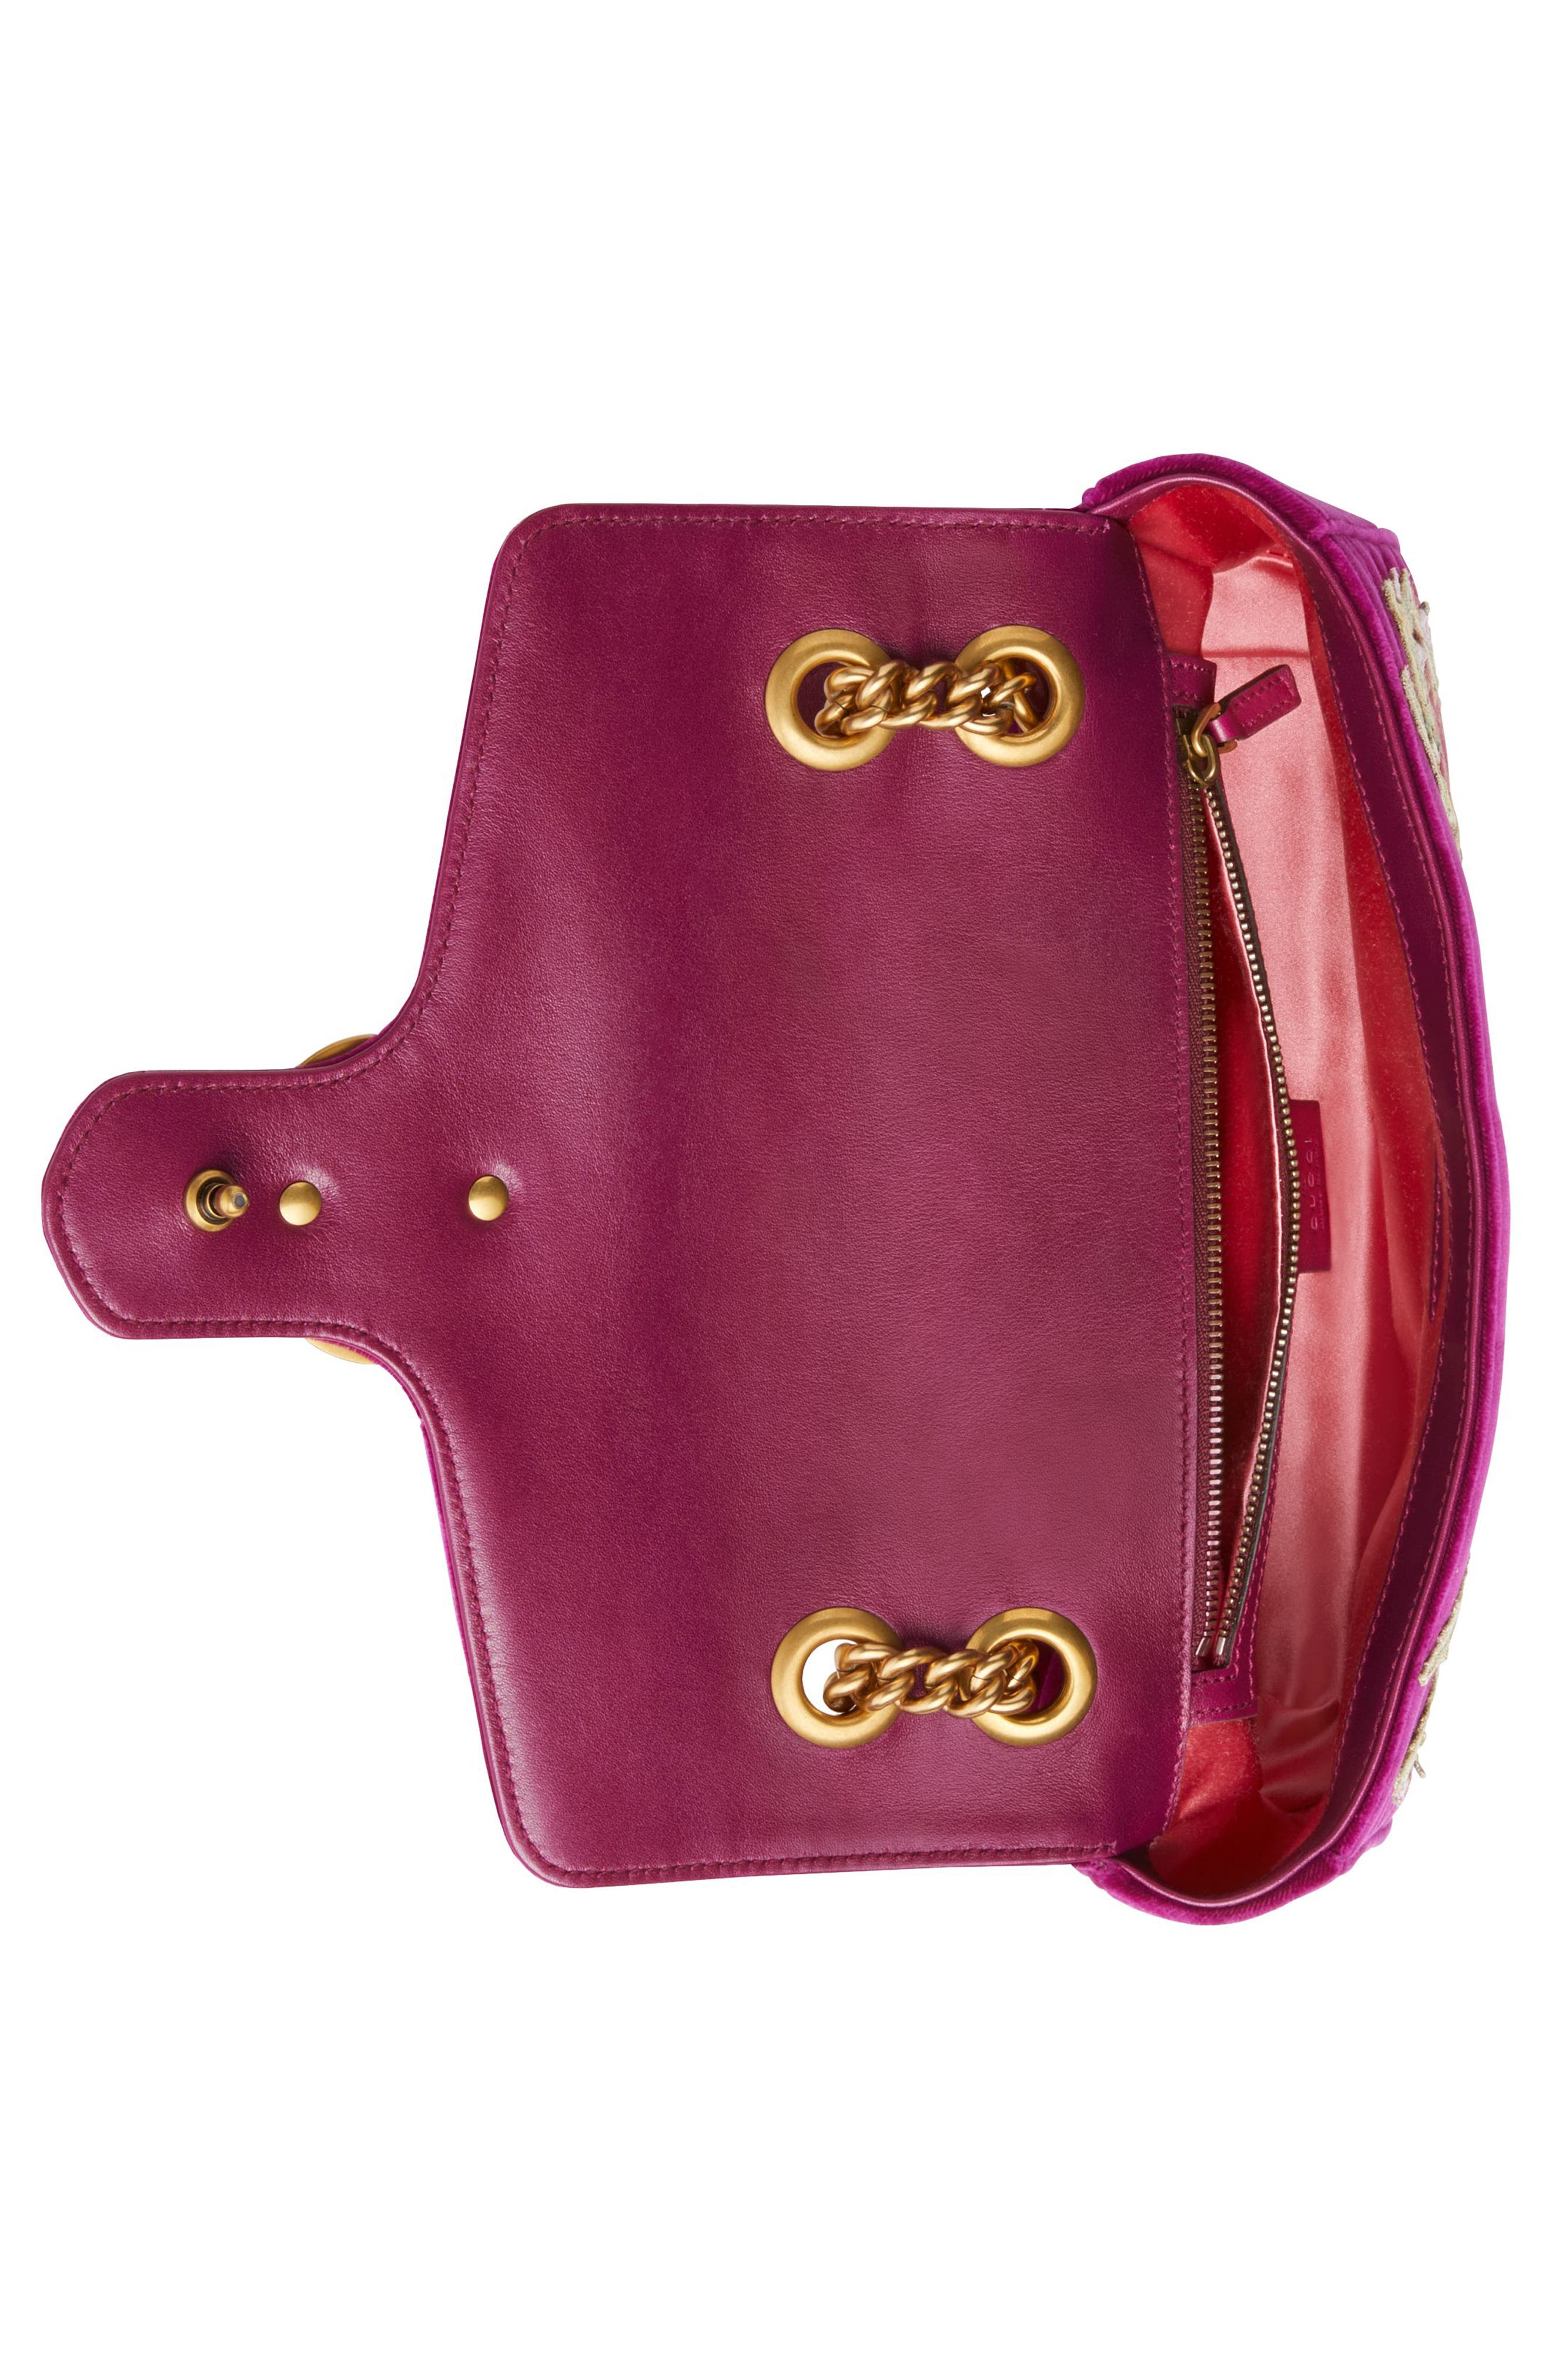 Small GG Marmont 2.0 Matelassé Velvet Shoulder Bag,                             Alternate thumbnail 3, color,                             Fuchsia/ Fuchsia